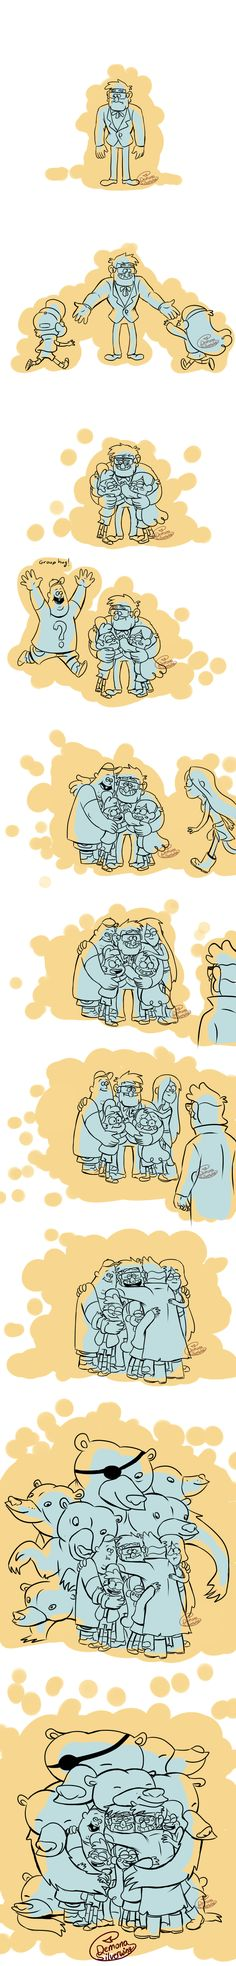 Group Hug by Demona-Silverwing.deviantart.com on @DeviantArt